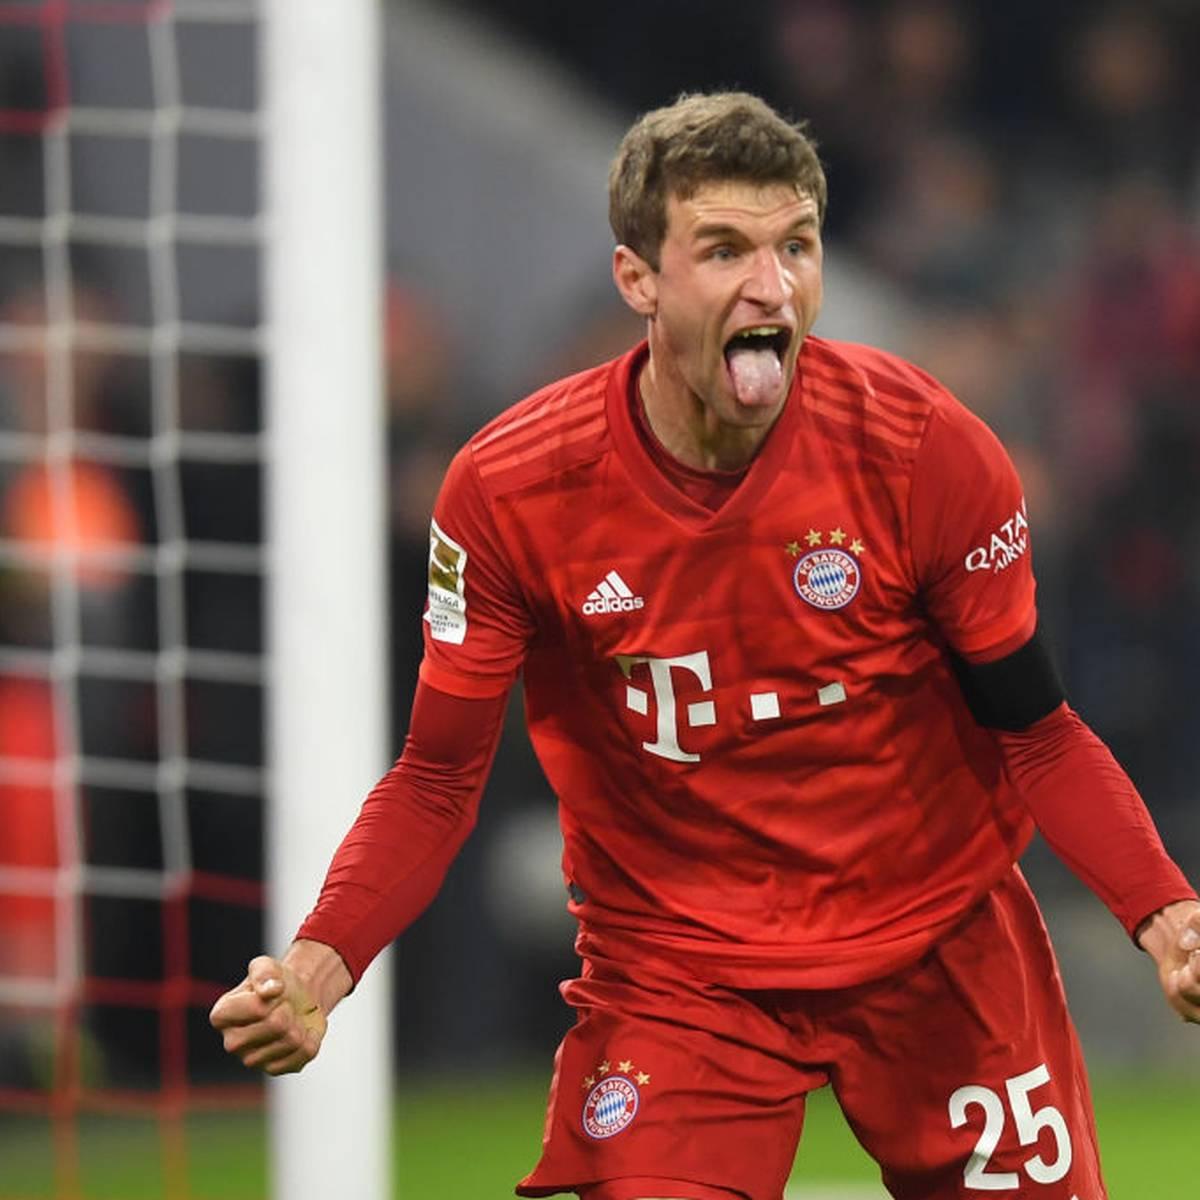 Wieso Müllers EM-Traum wieder lebt